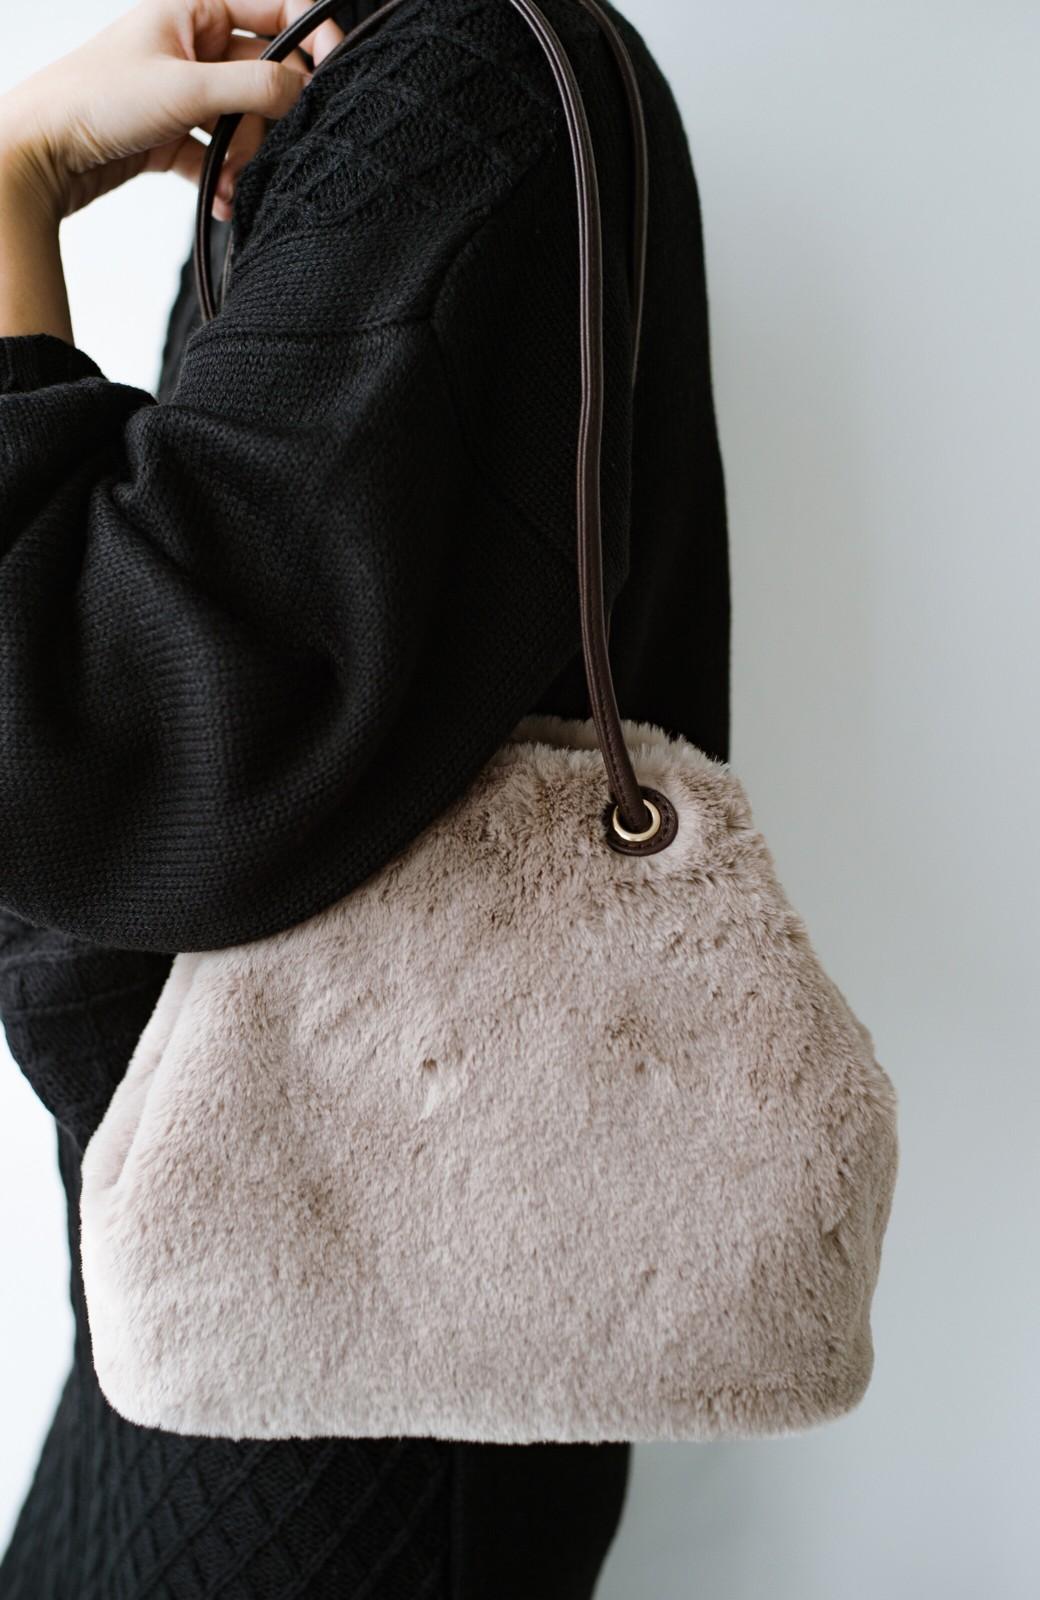 haco! さっと持って気分が上がる ふわっとかわいいエコファー巾着バッグ <グレイッシュベージュ>の商品写真6